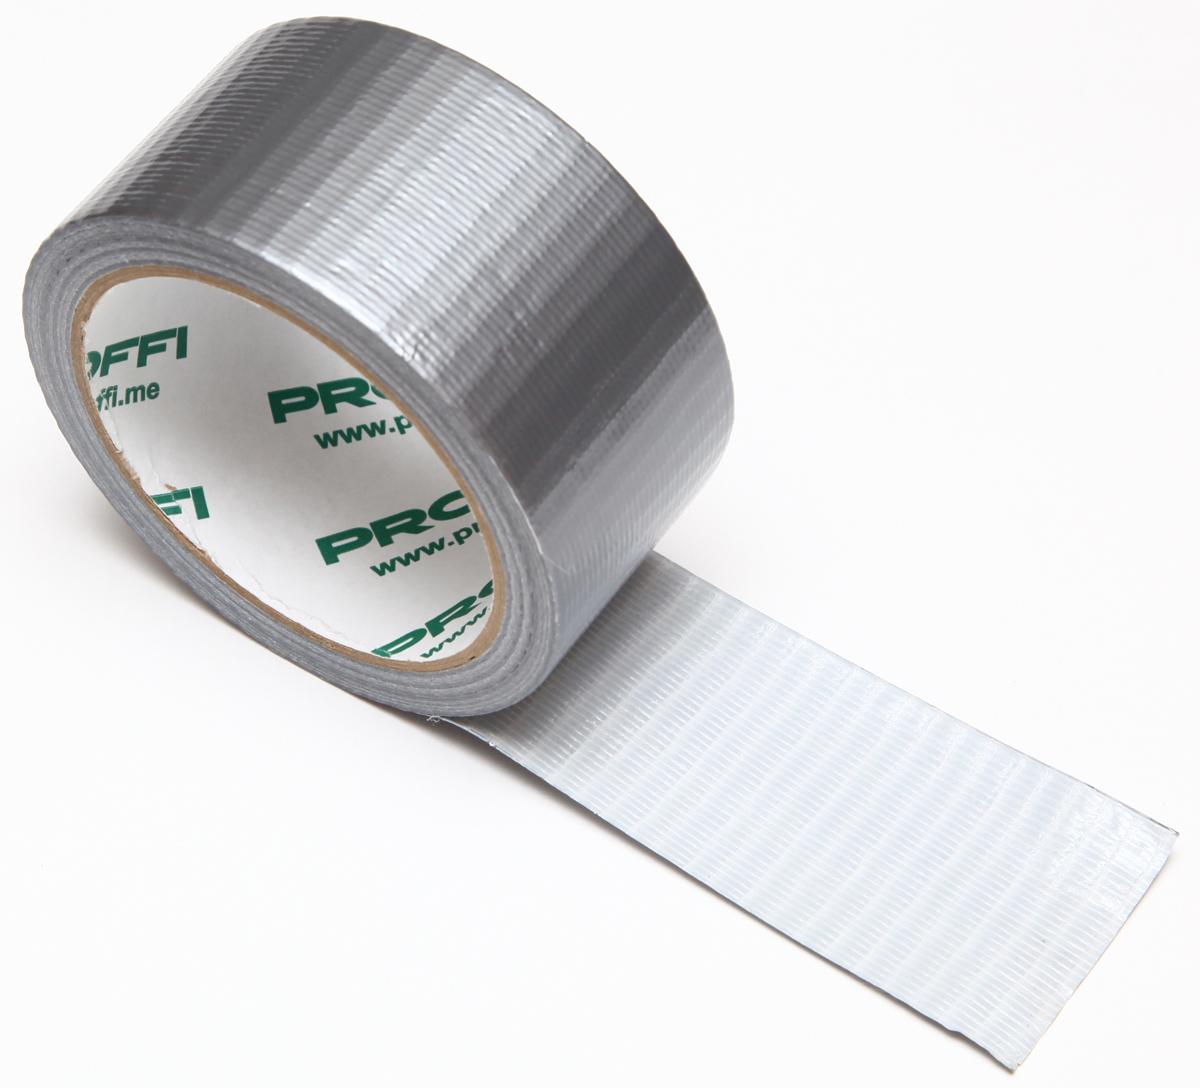 Сантехническая лента Proffi, 48 мм х 25 м шланг подающий gardena 25 мм х 25 м 02792 20